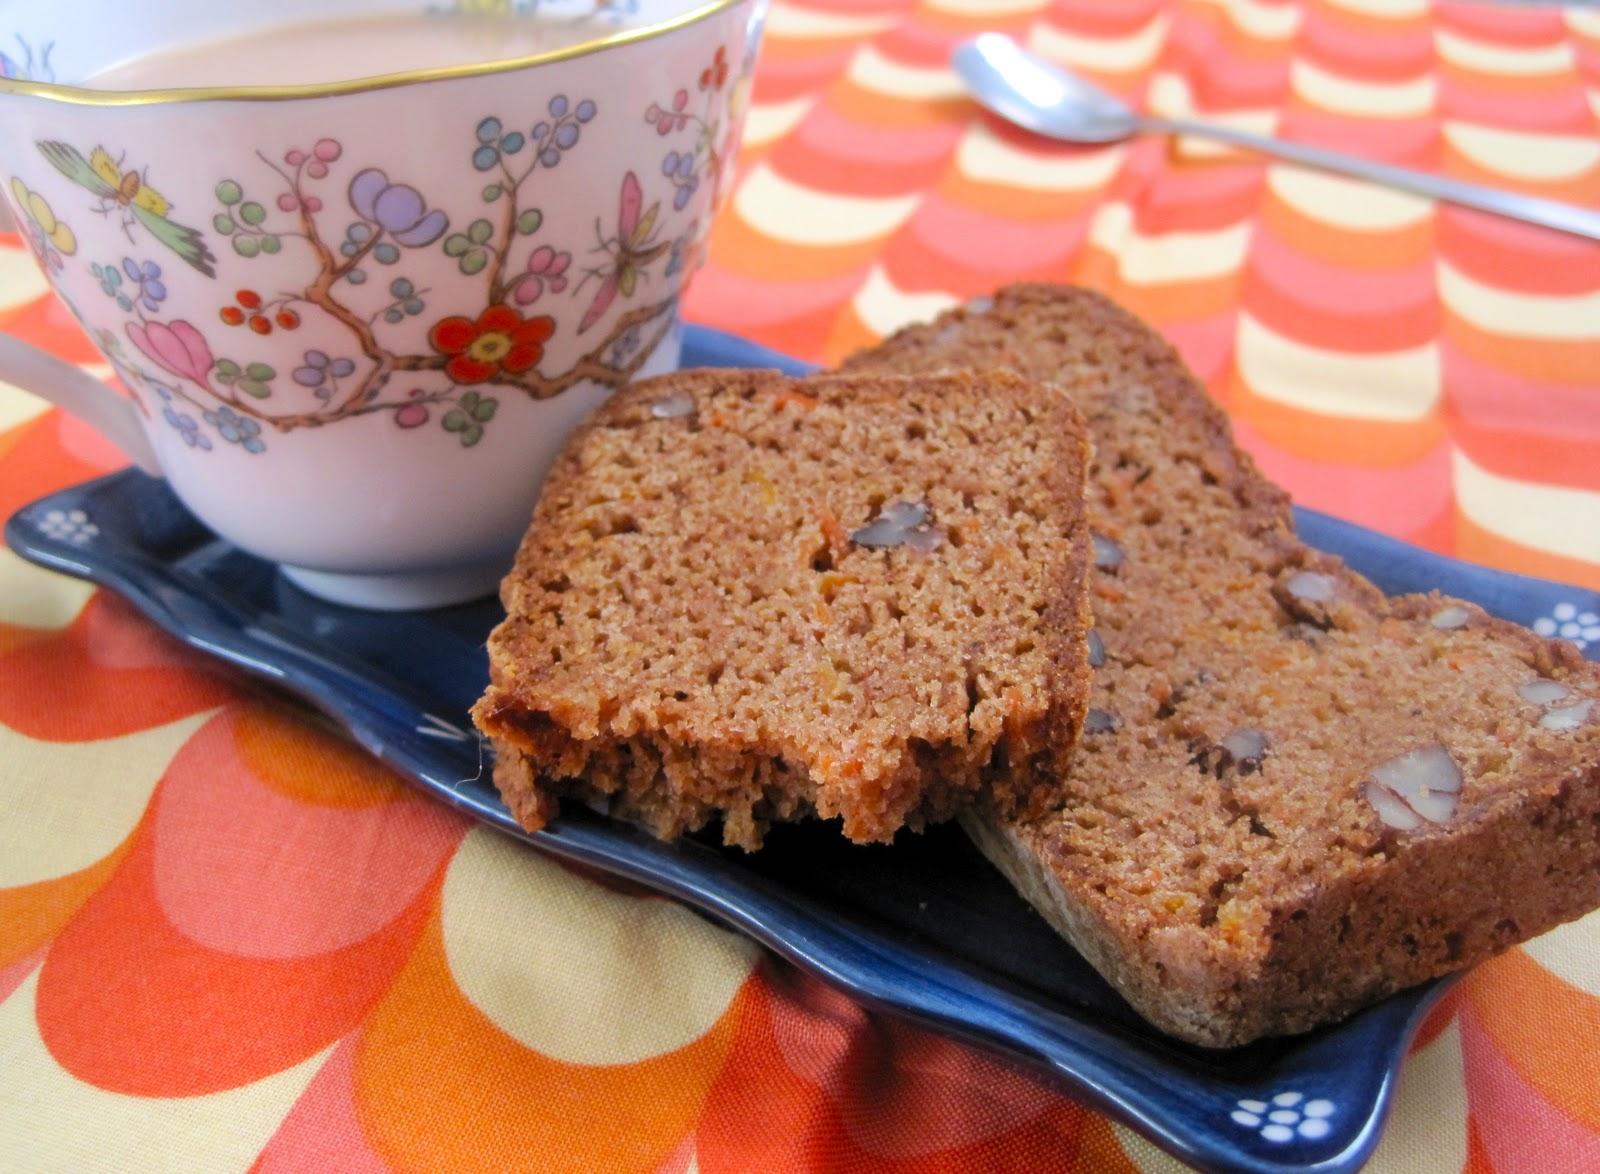 delectably gluten-free: Cinnamon Carrot Bread